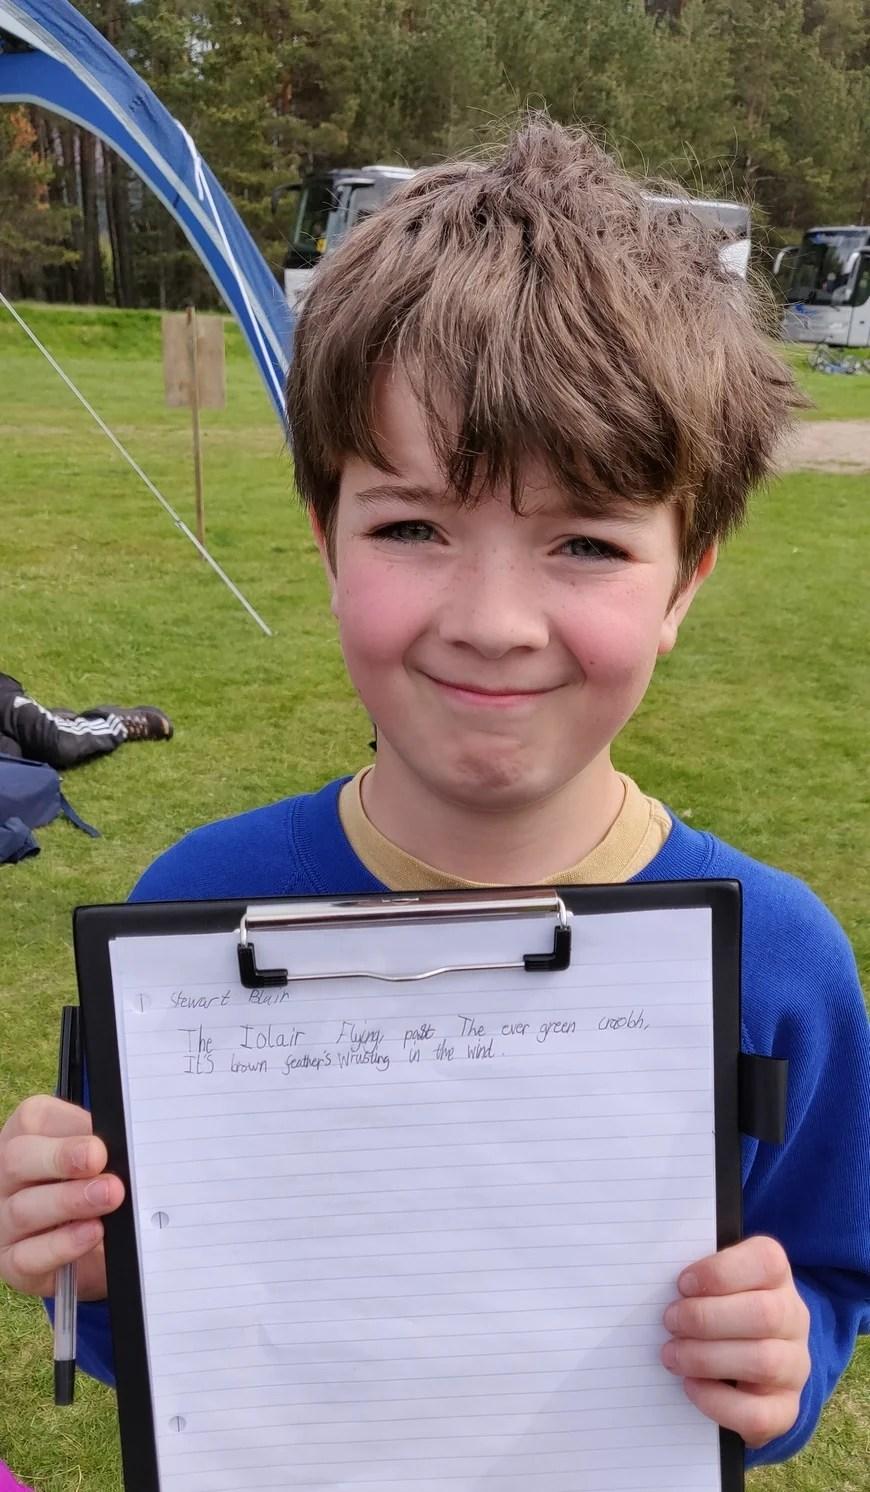 School boy shows his hand-written poem on a clipboard.